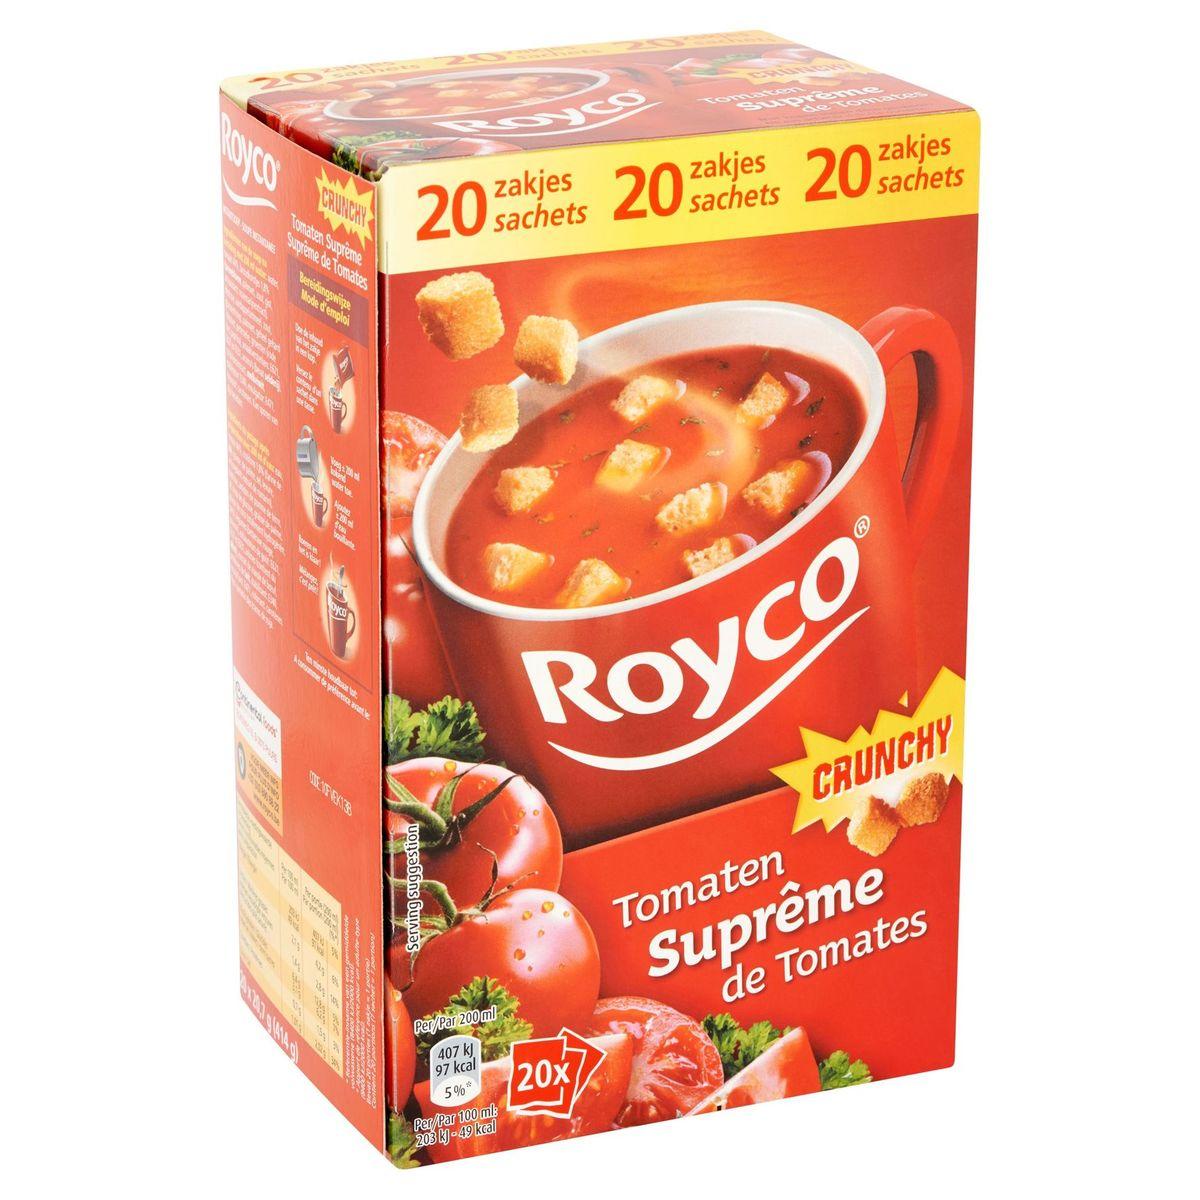 Royco Crunchy Tomaten Suprême 20 x 20.7 g